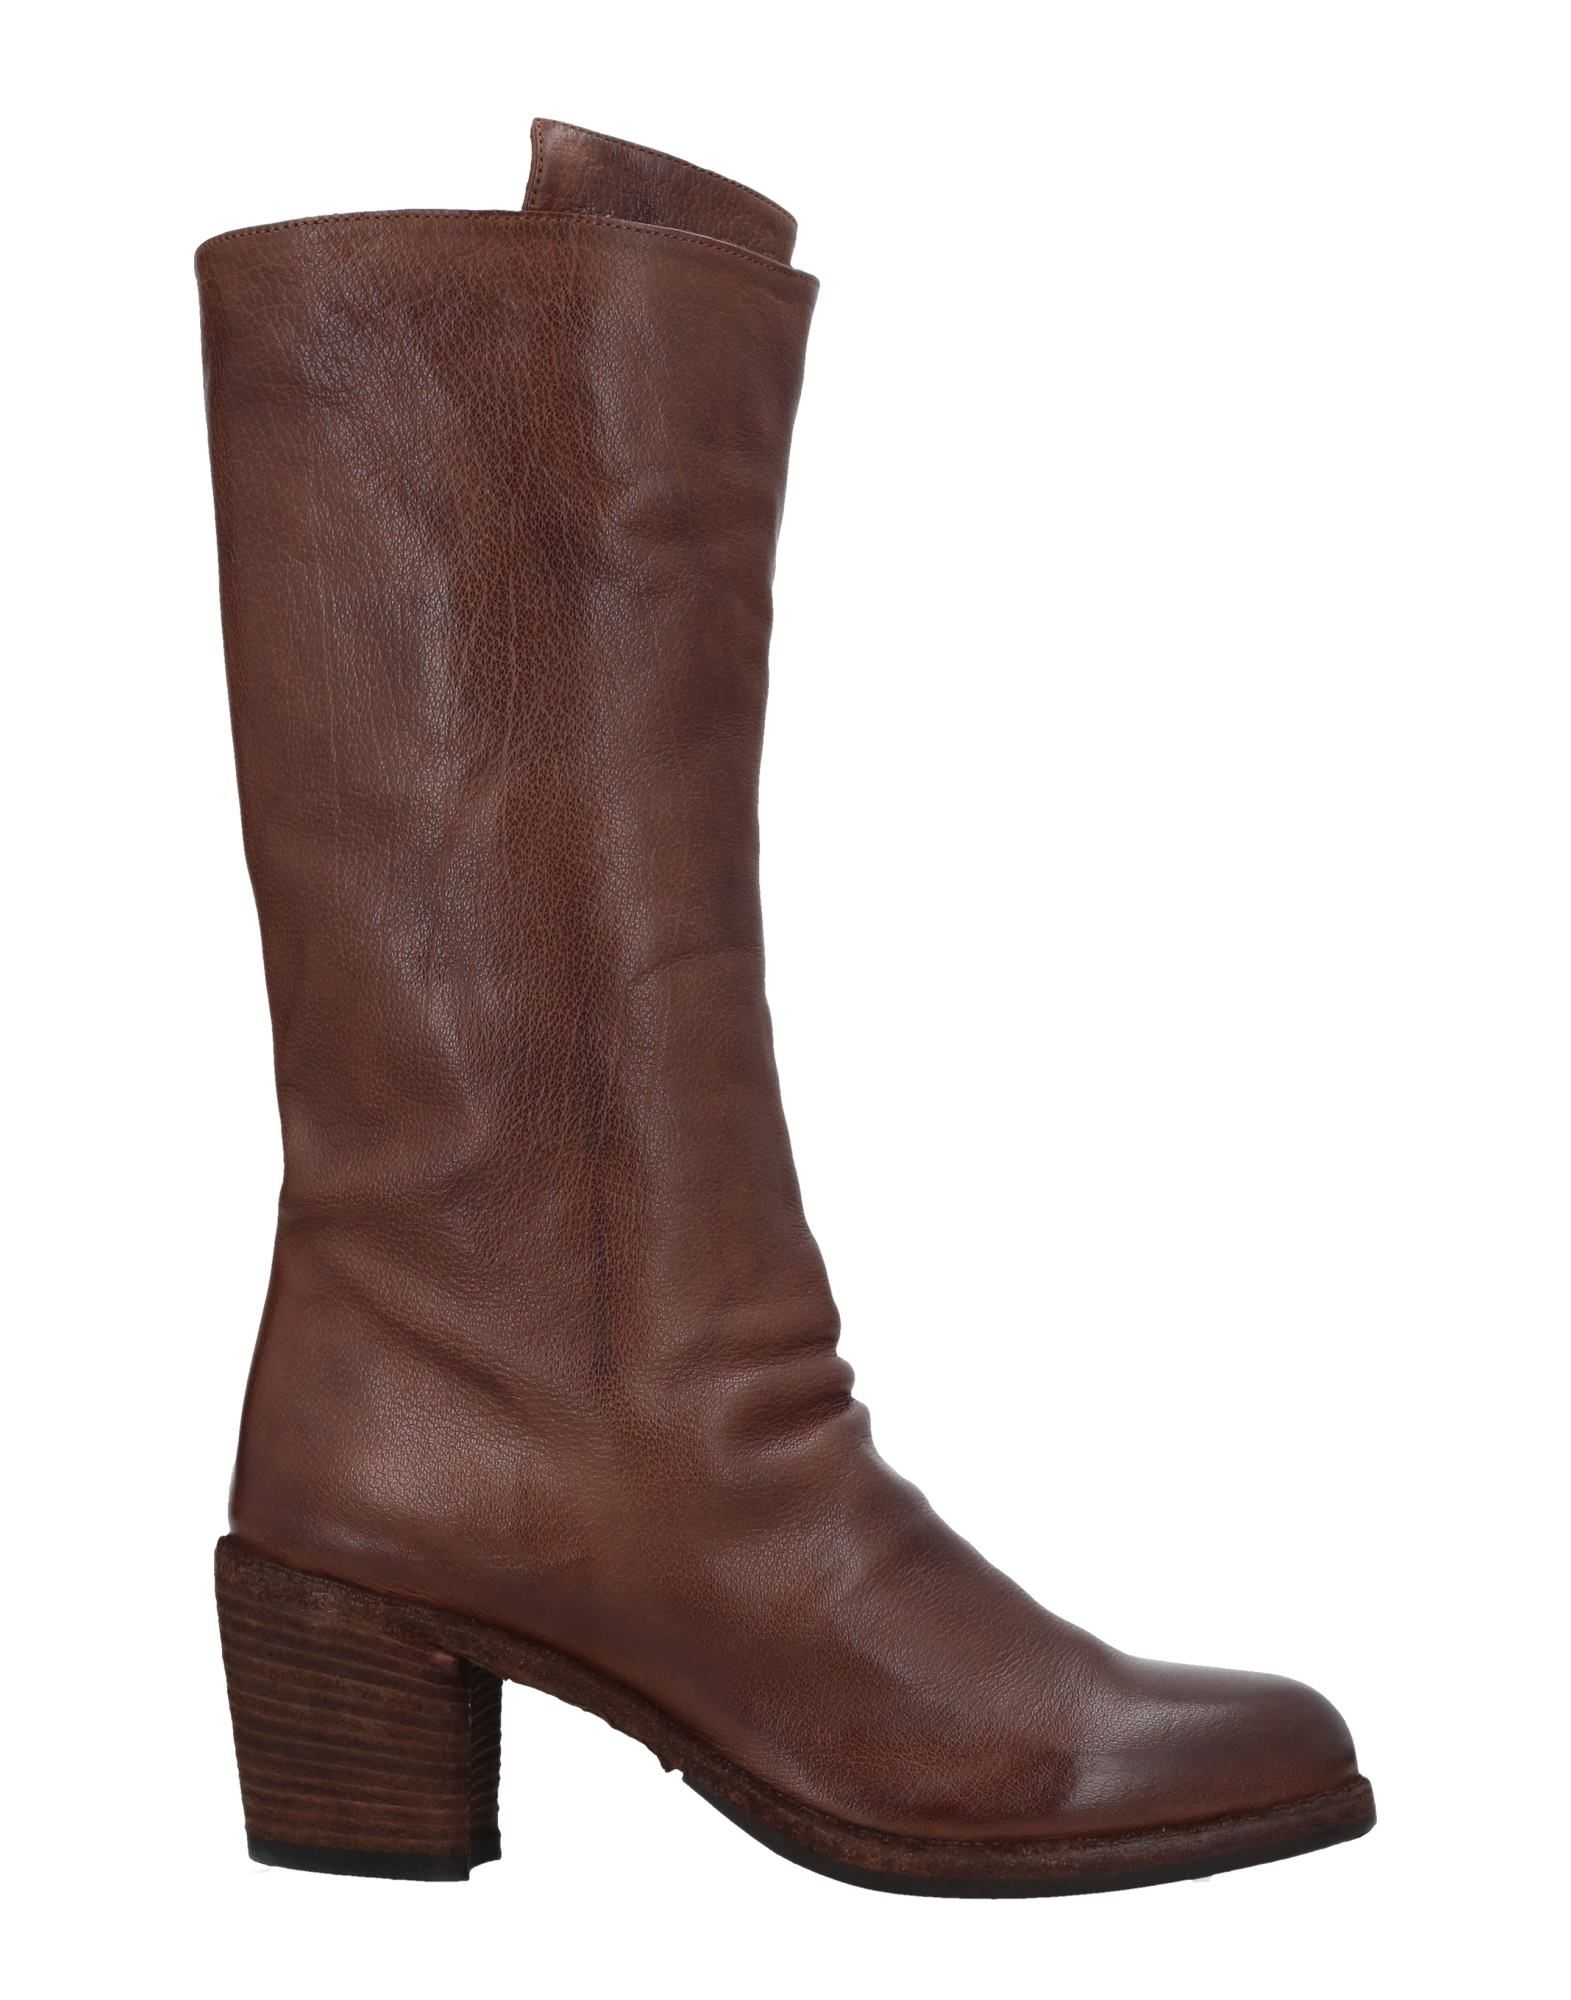 Officine Creative Italia Boots - Boots Women Officine Creative Italia Boots - online on  United Kingdom - 11513313BT 4d3c7c